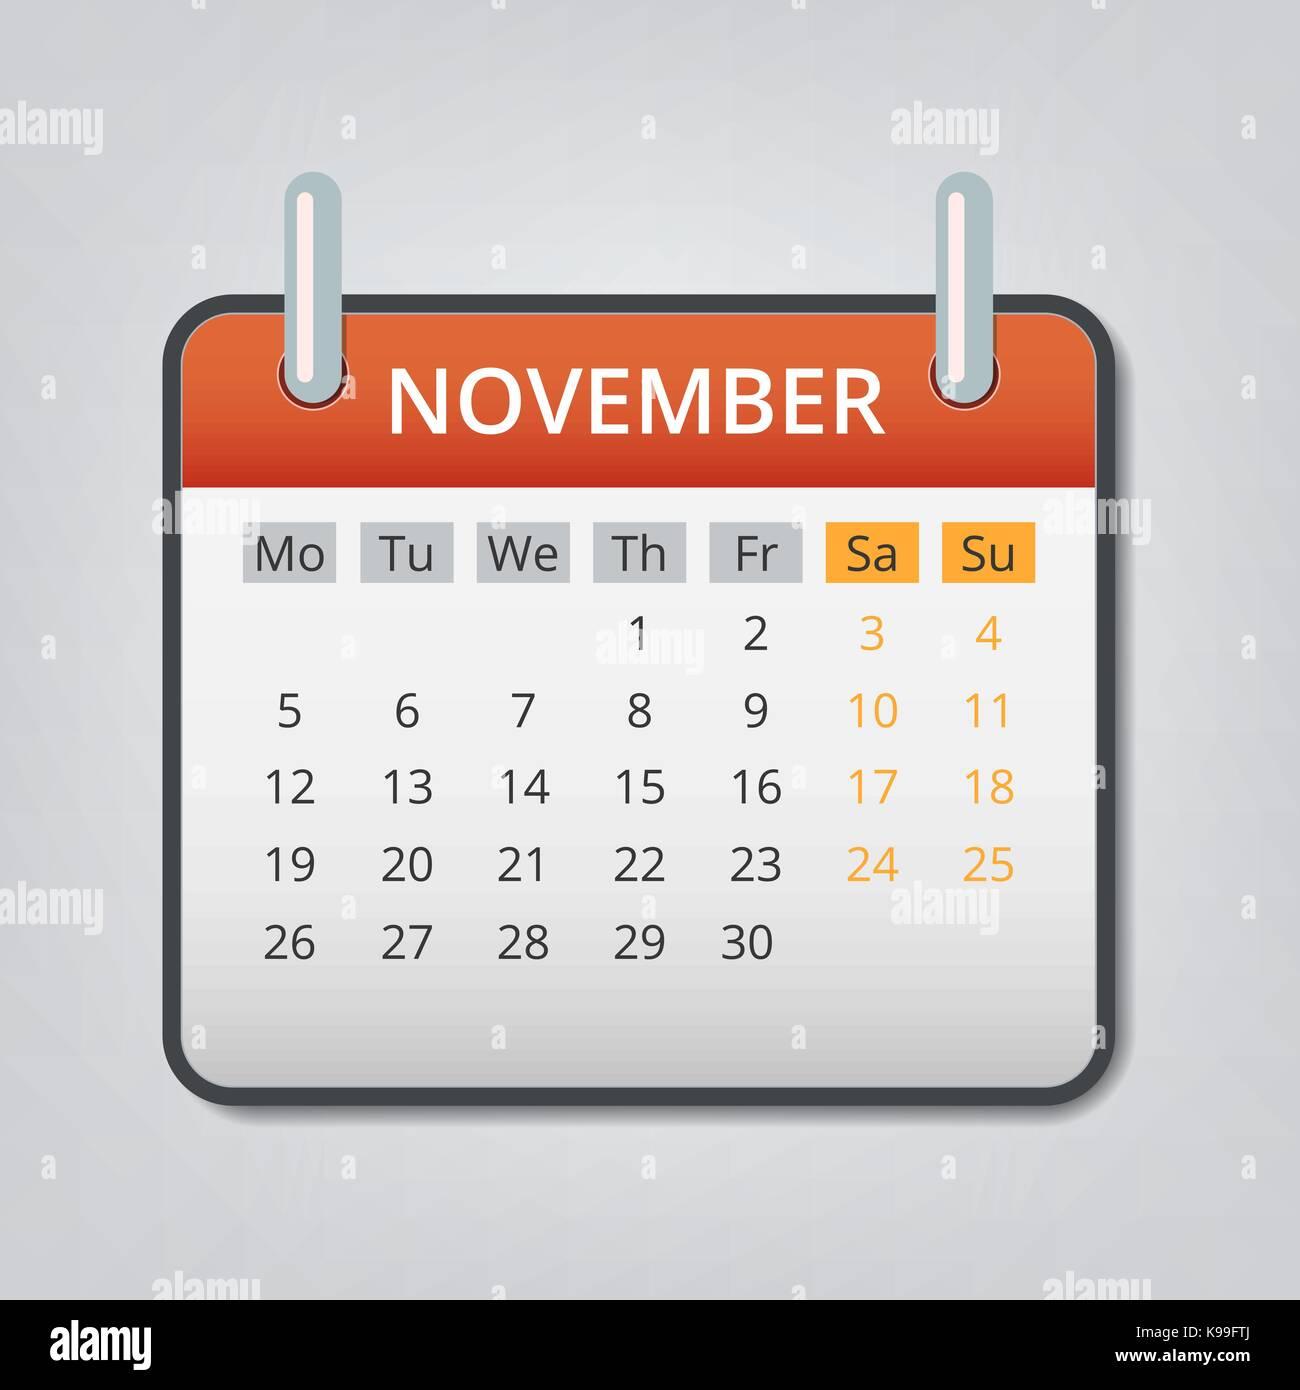 november 2018 calendar dates